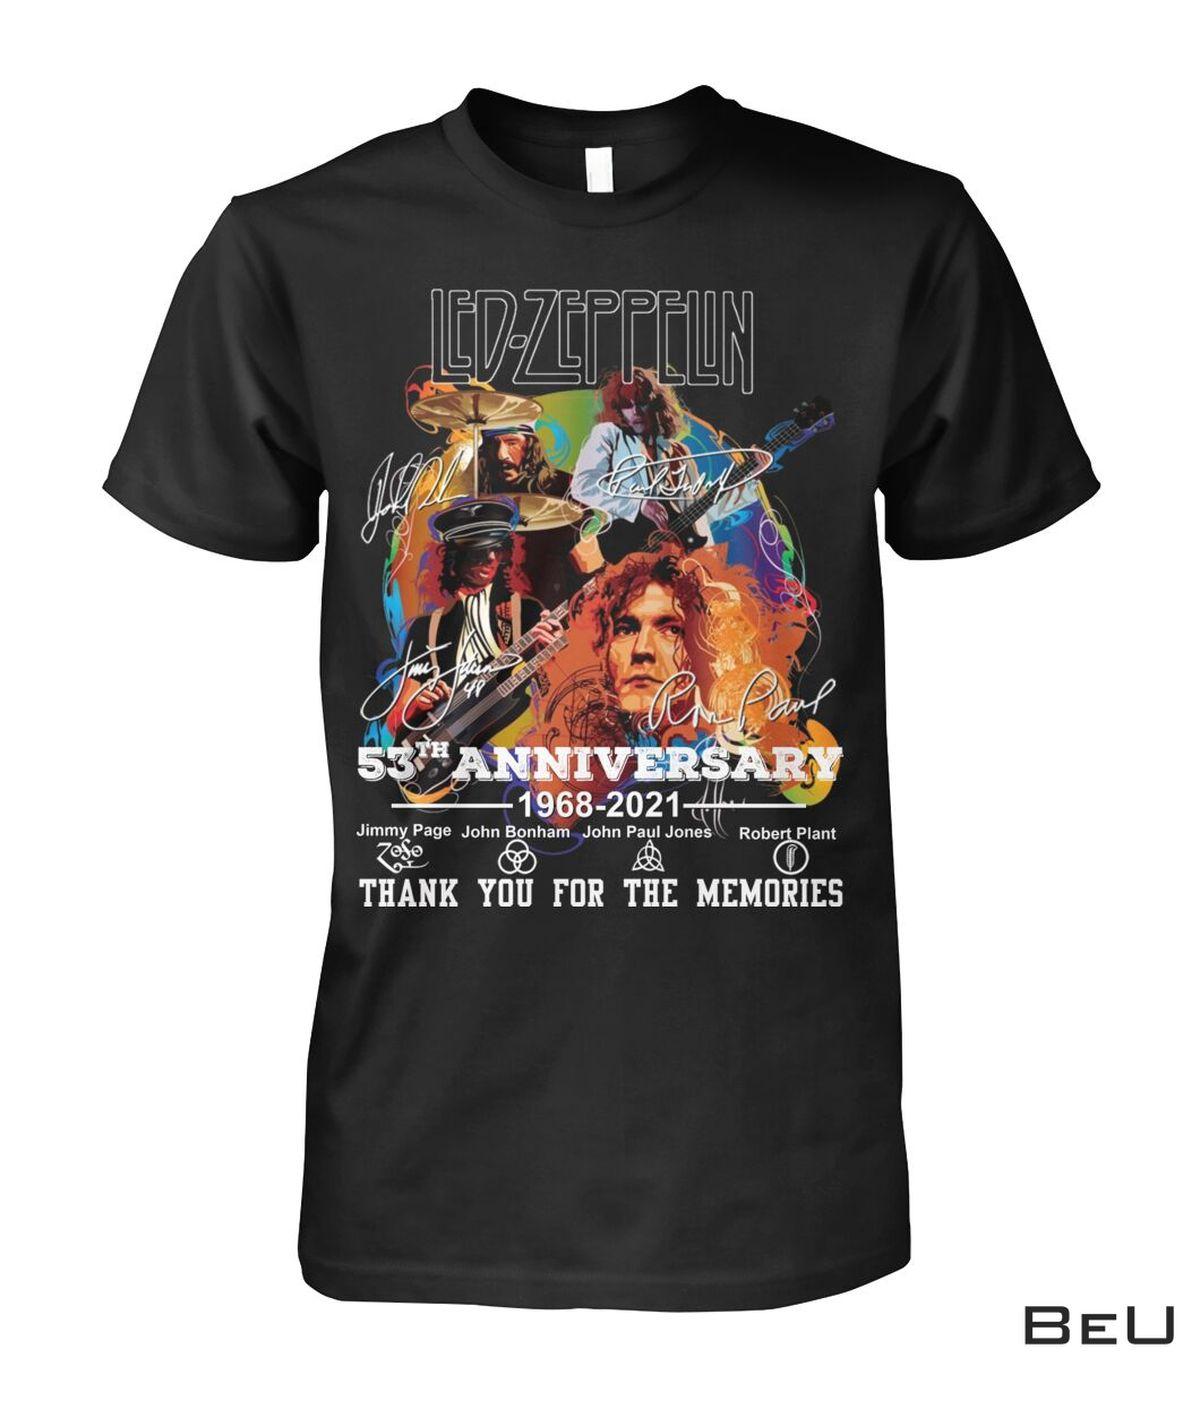 Led Zeppelin 53 Years Anniversary Shirt, hoodie, tank top